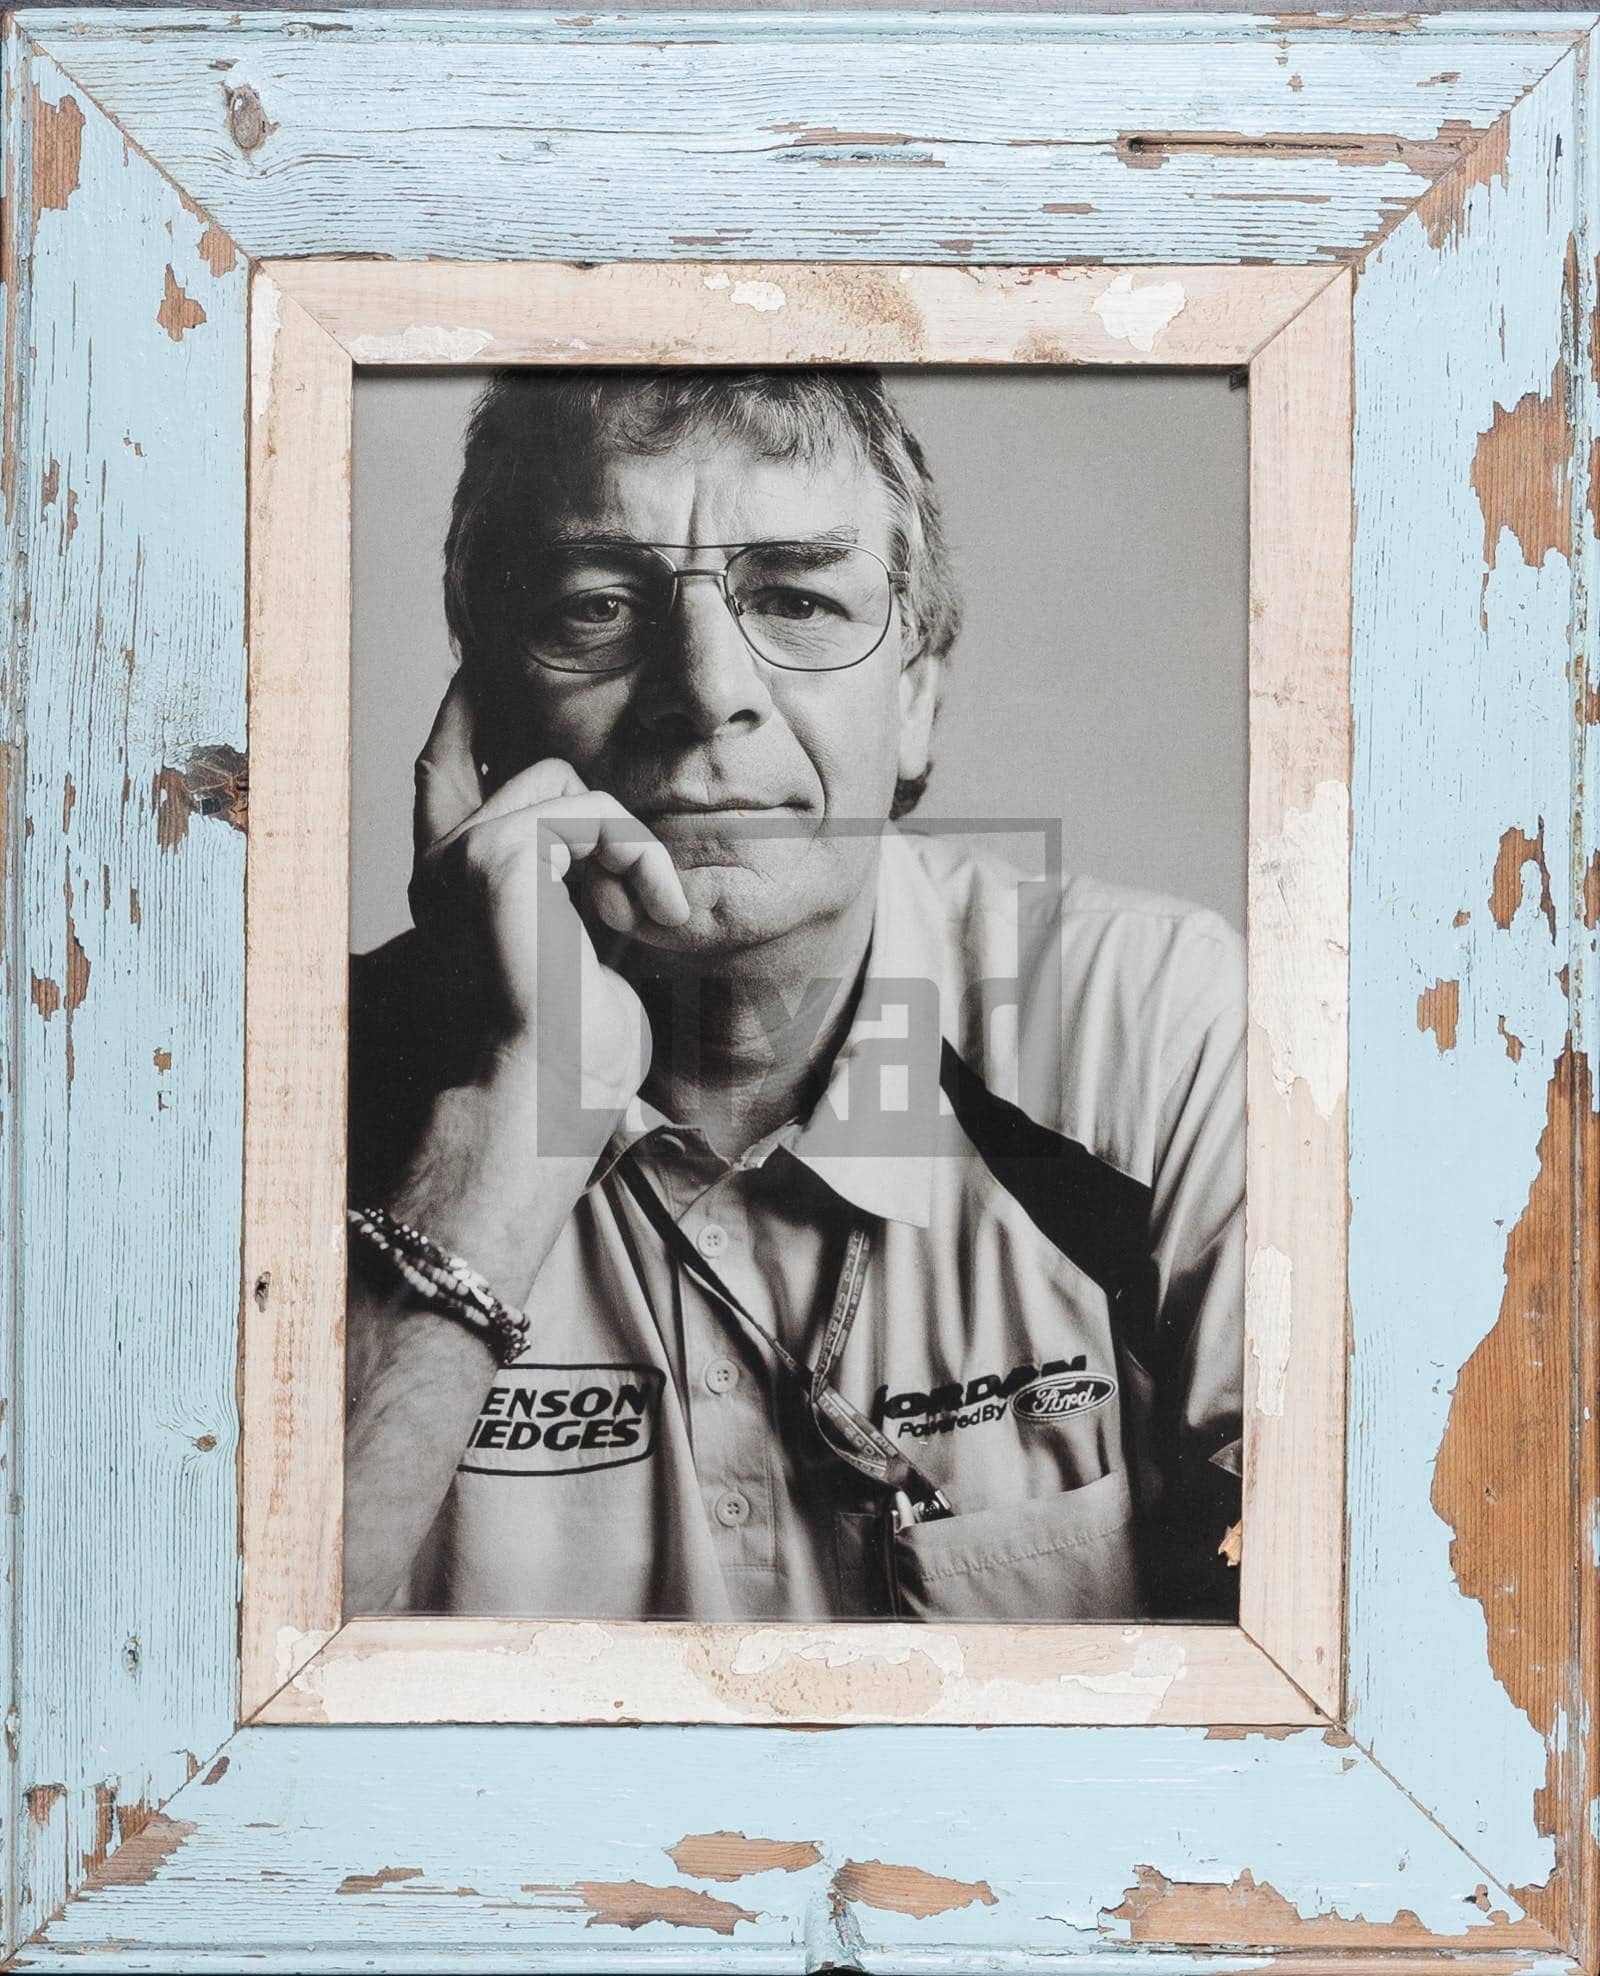 Bilderrahmen aus recyceltem Holz für ca. 21 x 29,7 cm große Fotos